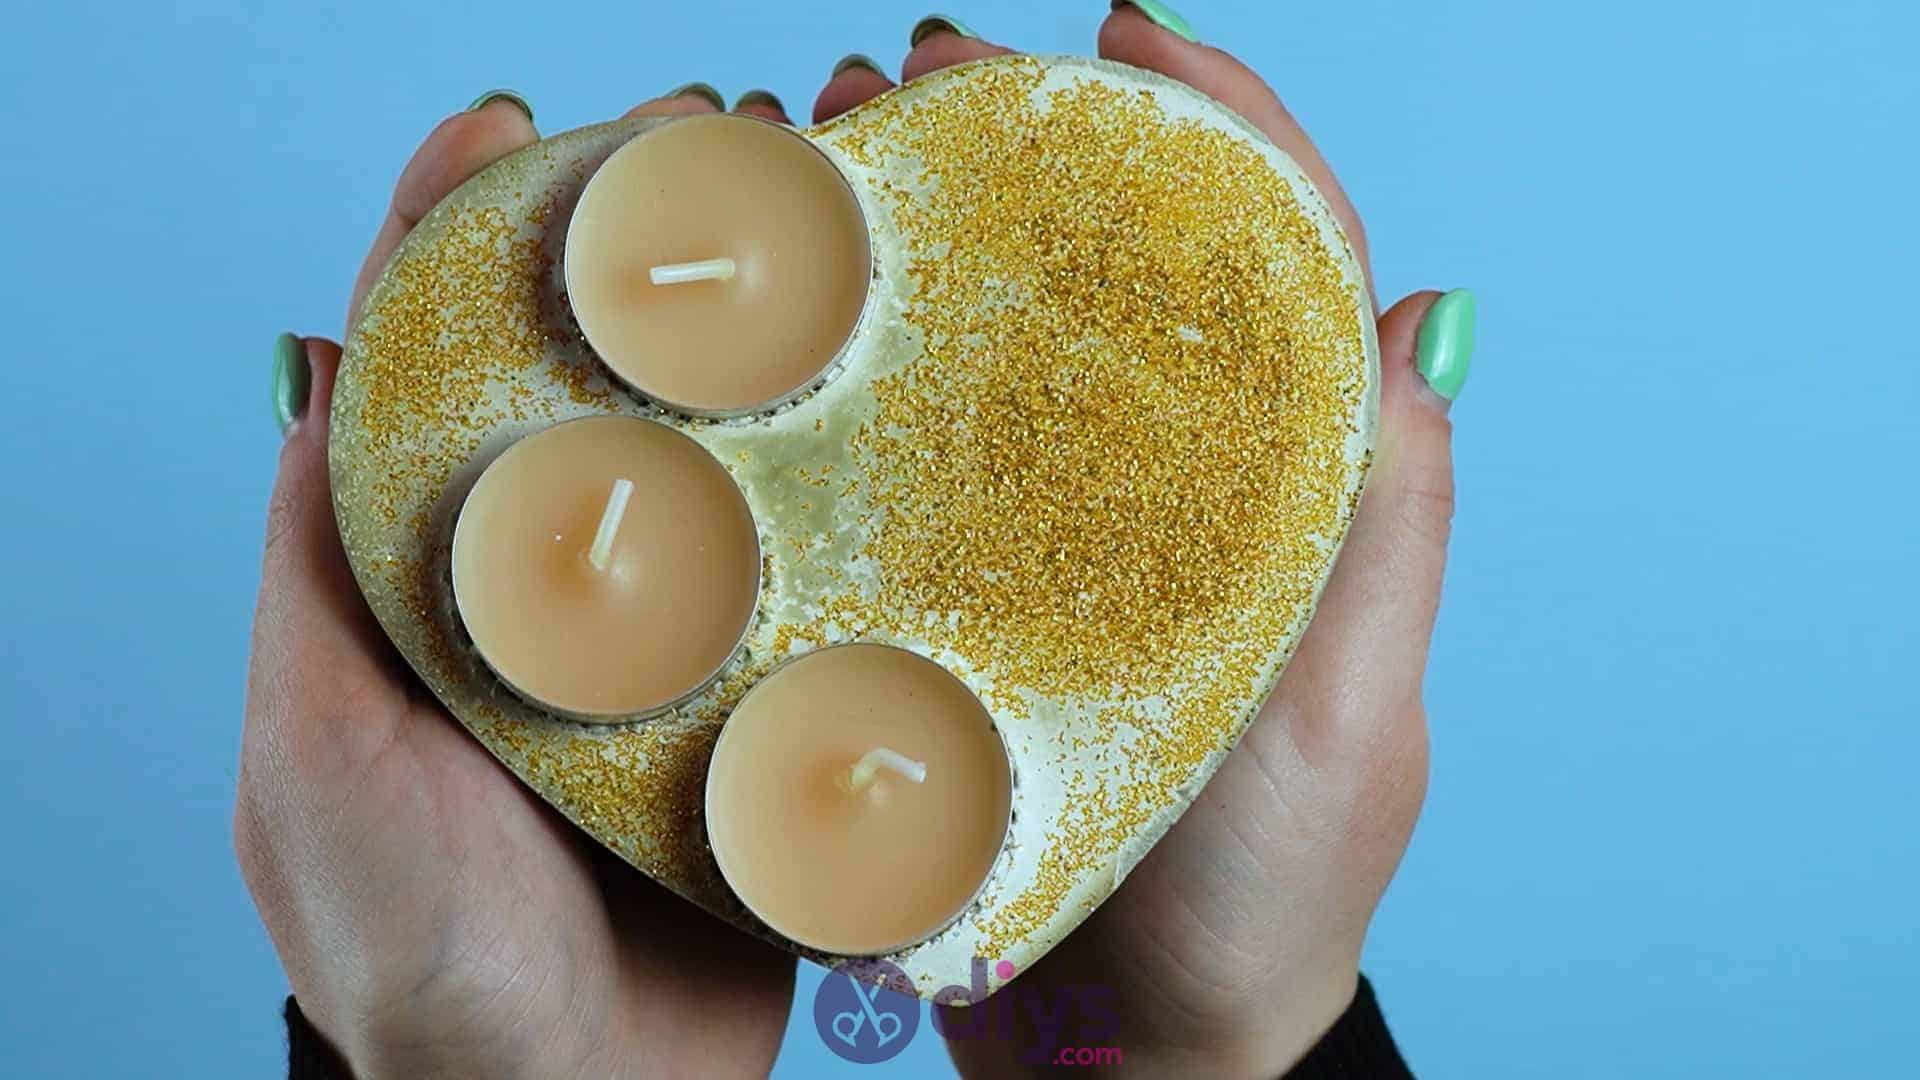 Diy concrete heart candle holder step 7b